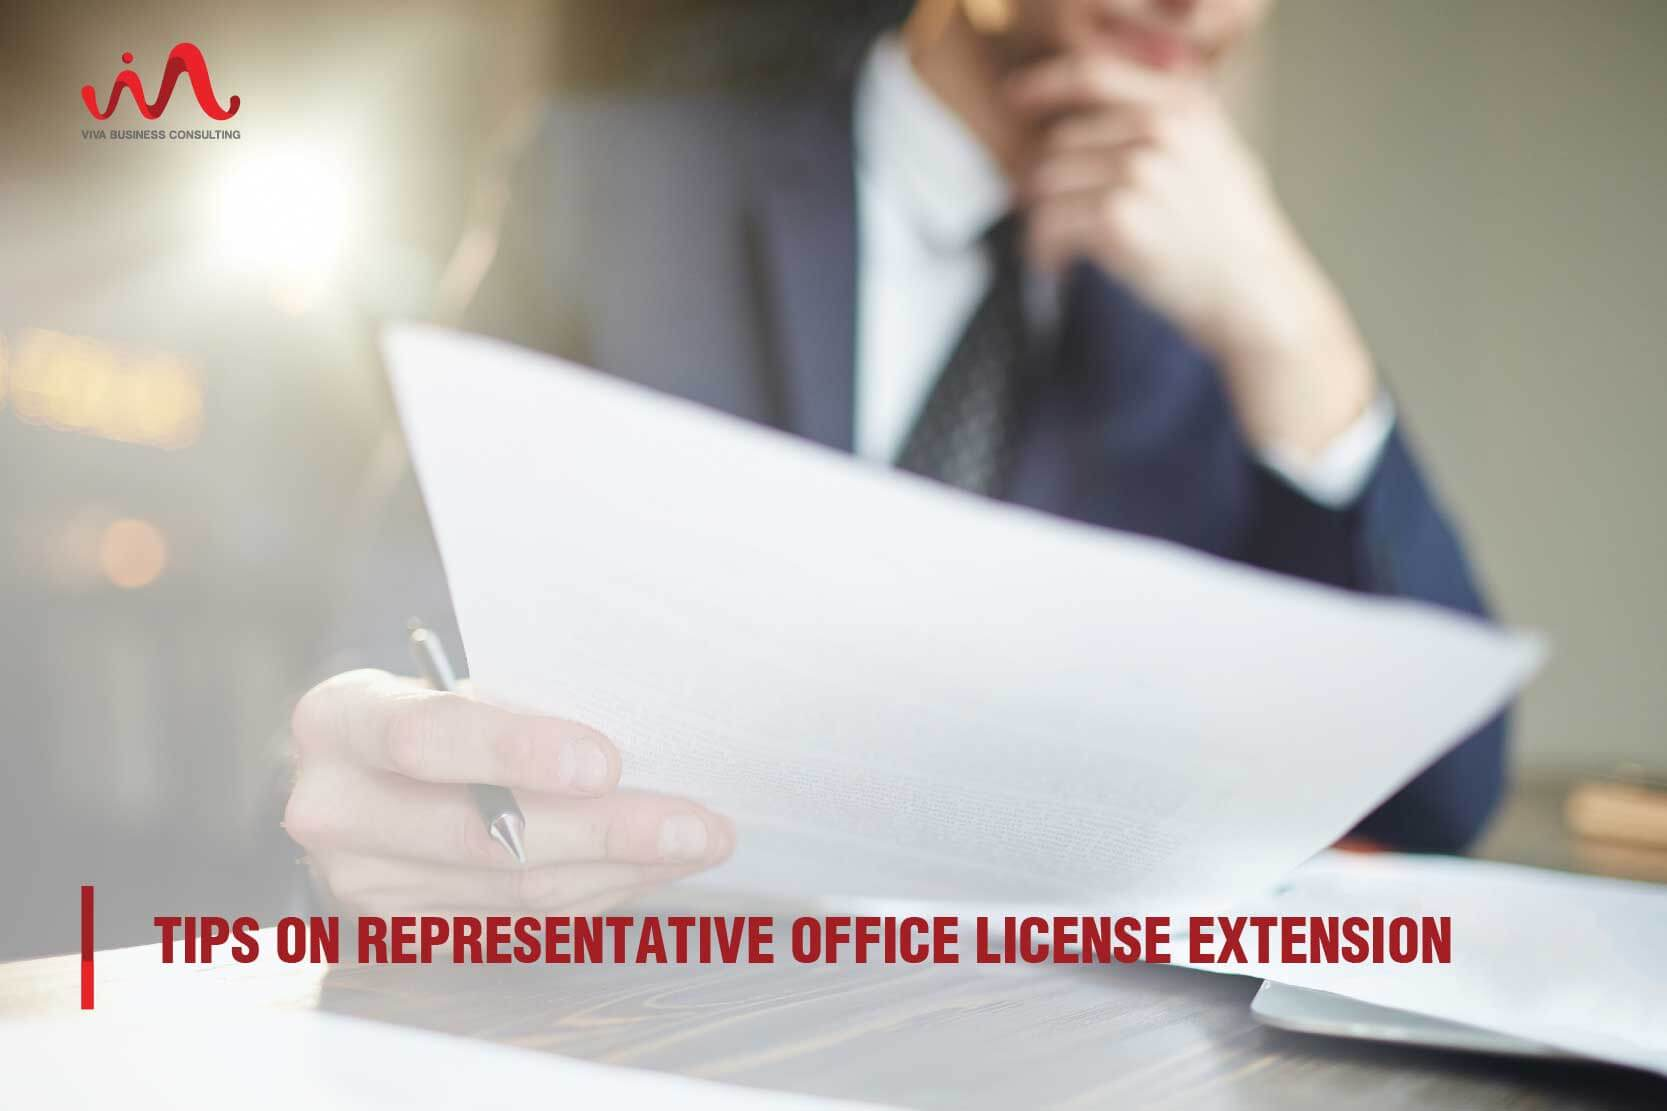 License extension of representative office in Vietnam